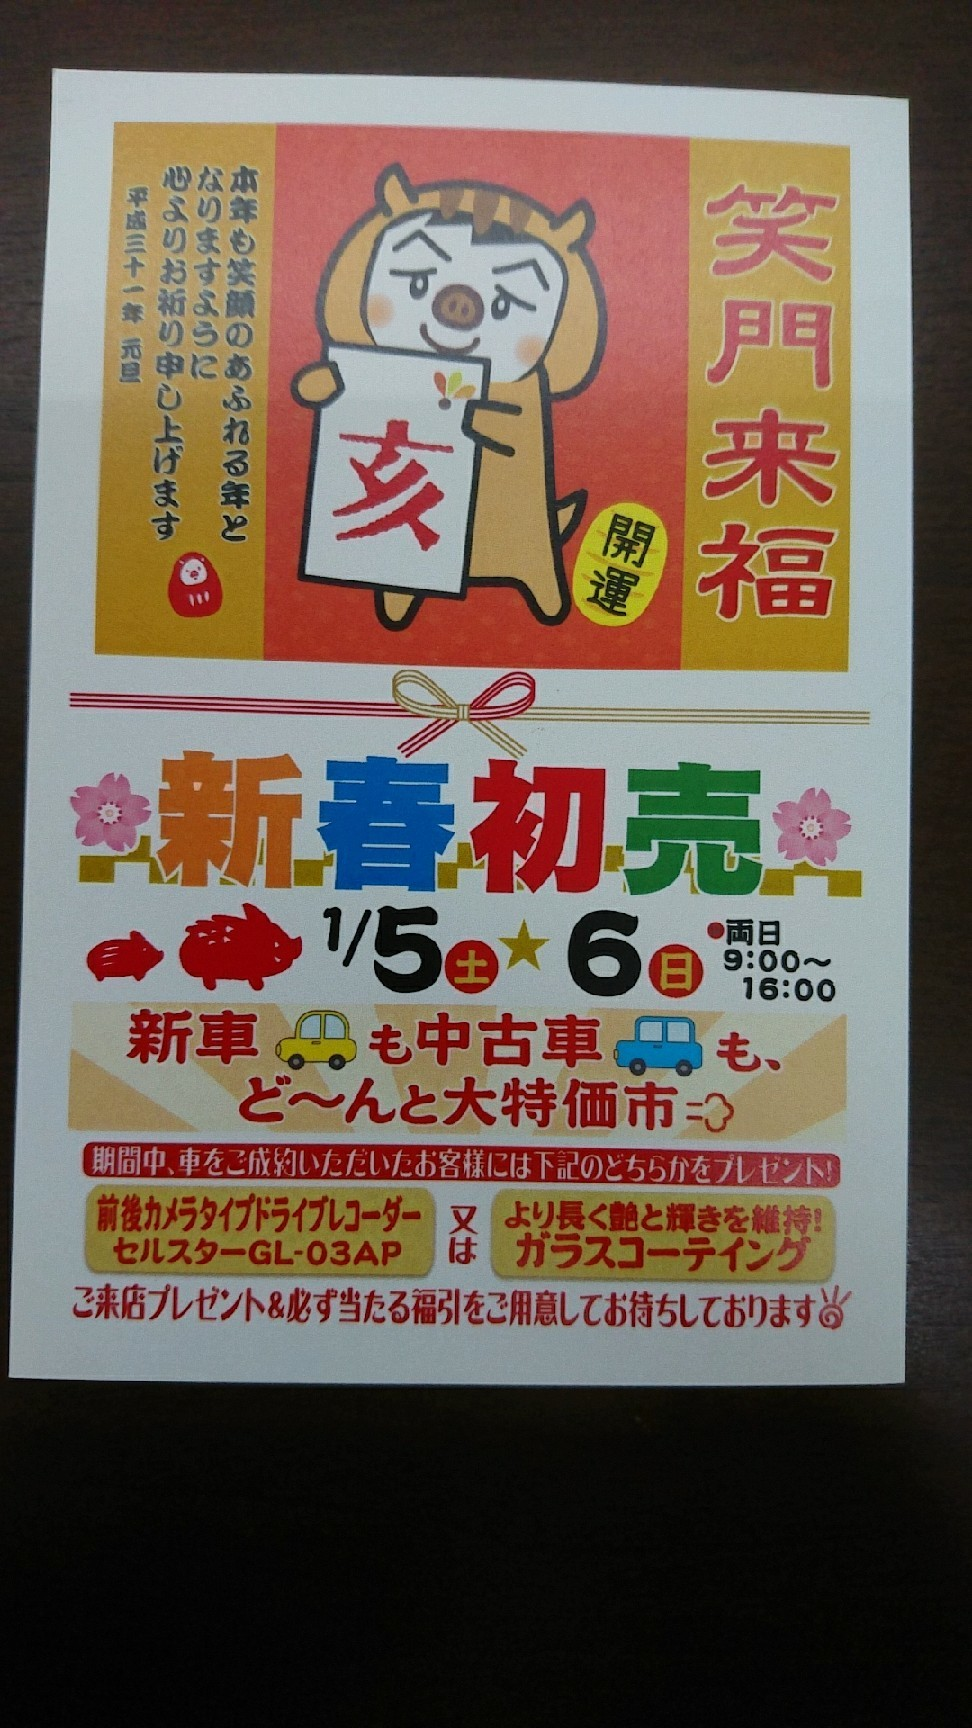 新春初売り_b0237229_09025292.jpg